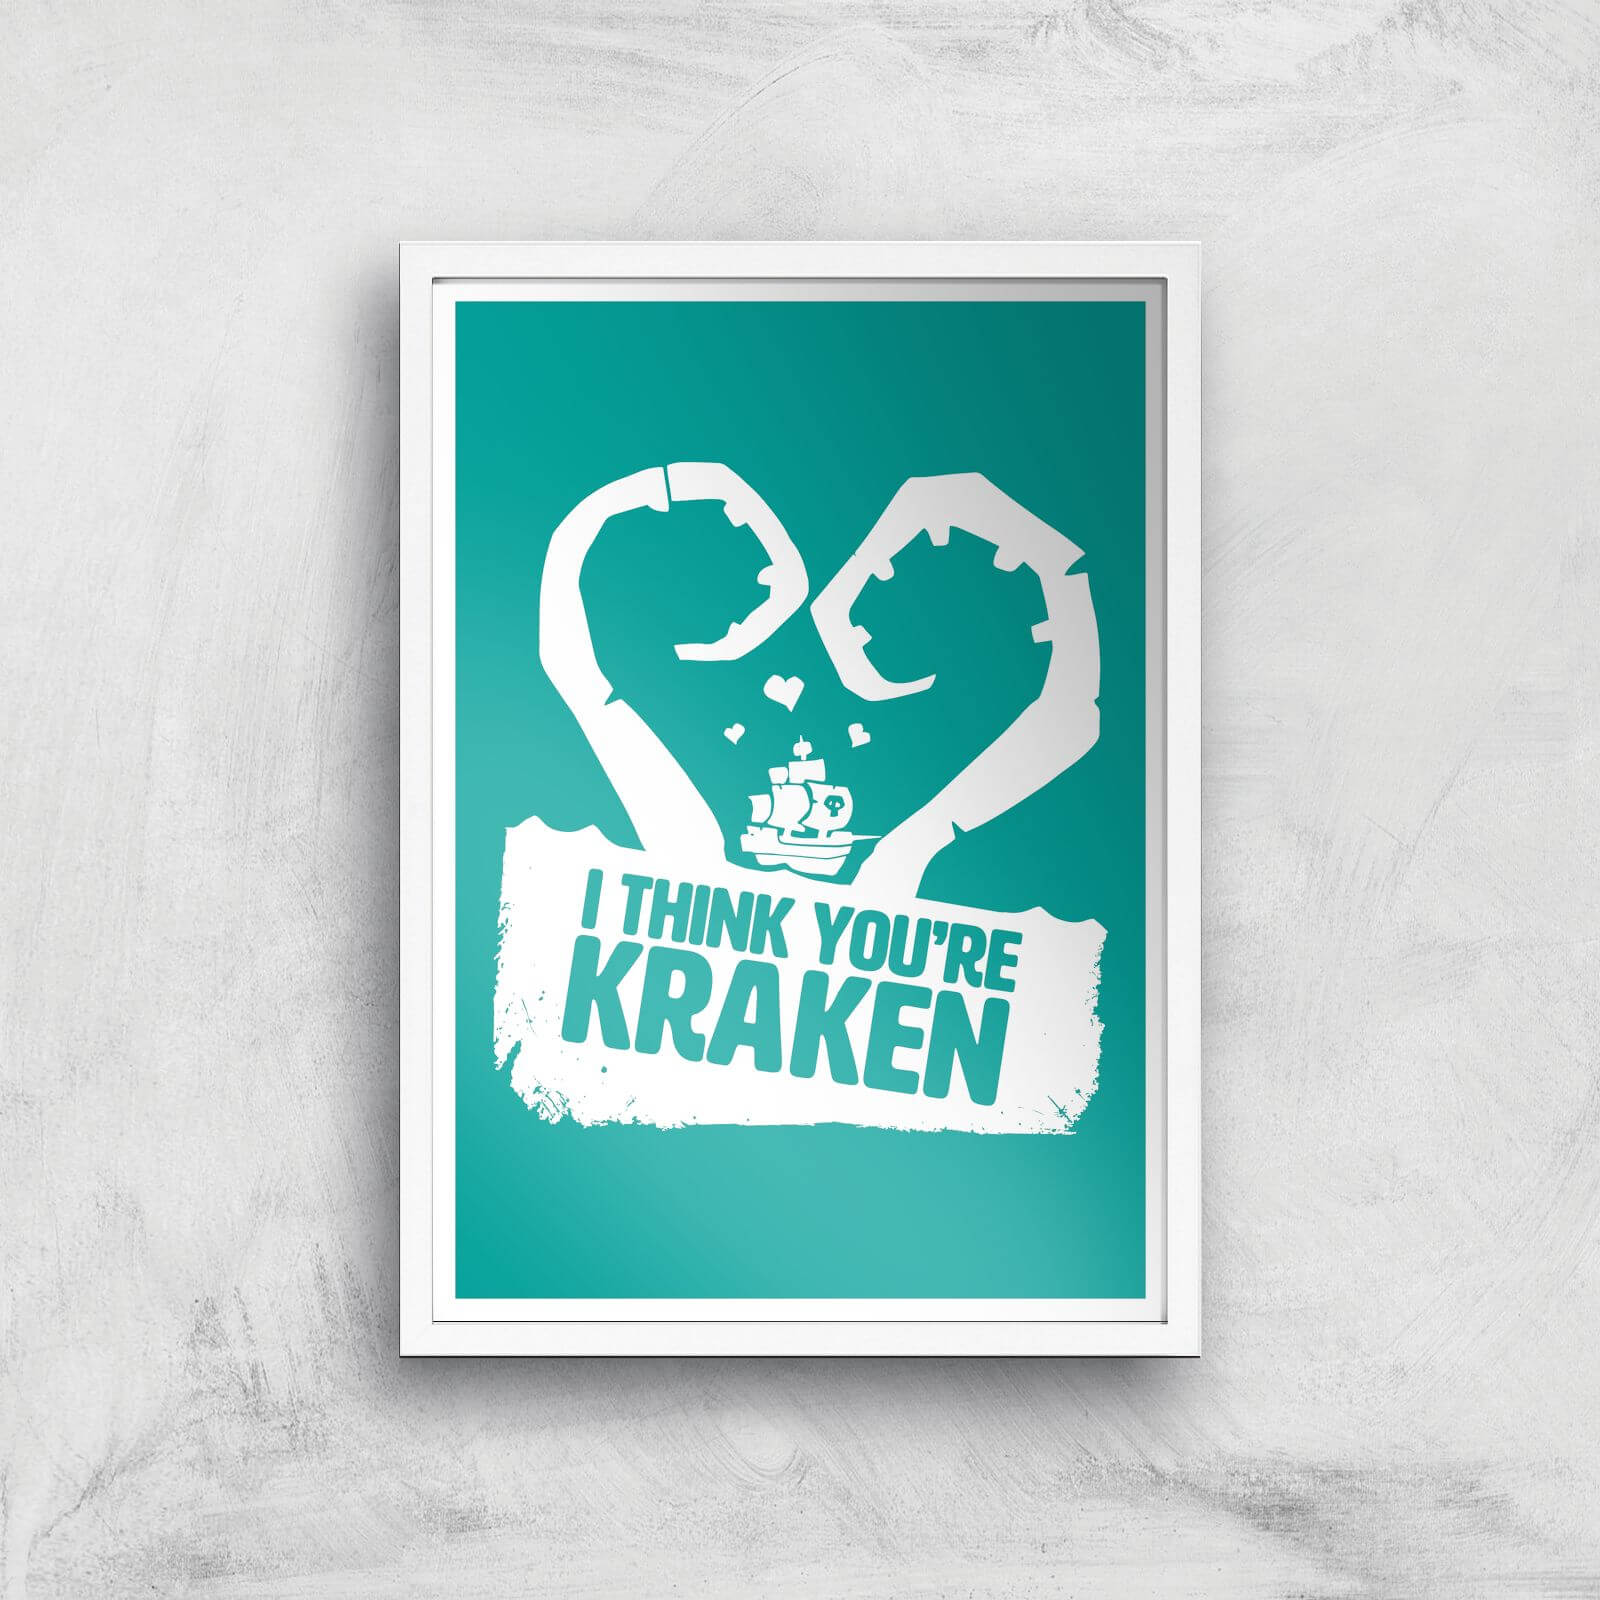 Sea Of Thieves I Think You're Kraken Print Giclee Art Print - A3 - White Frame